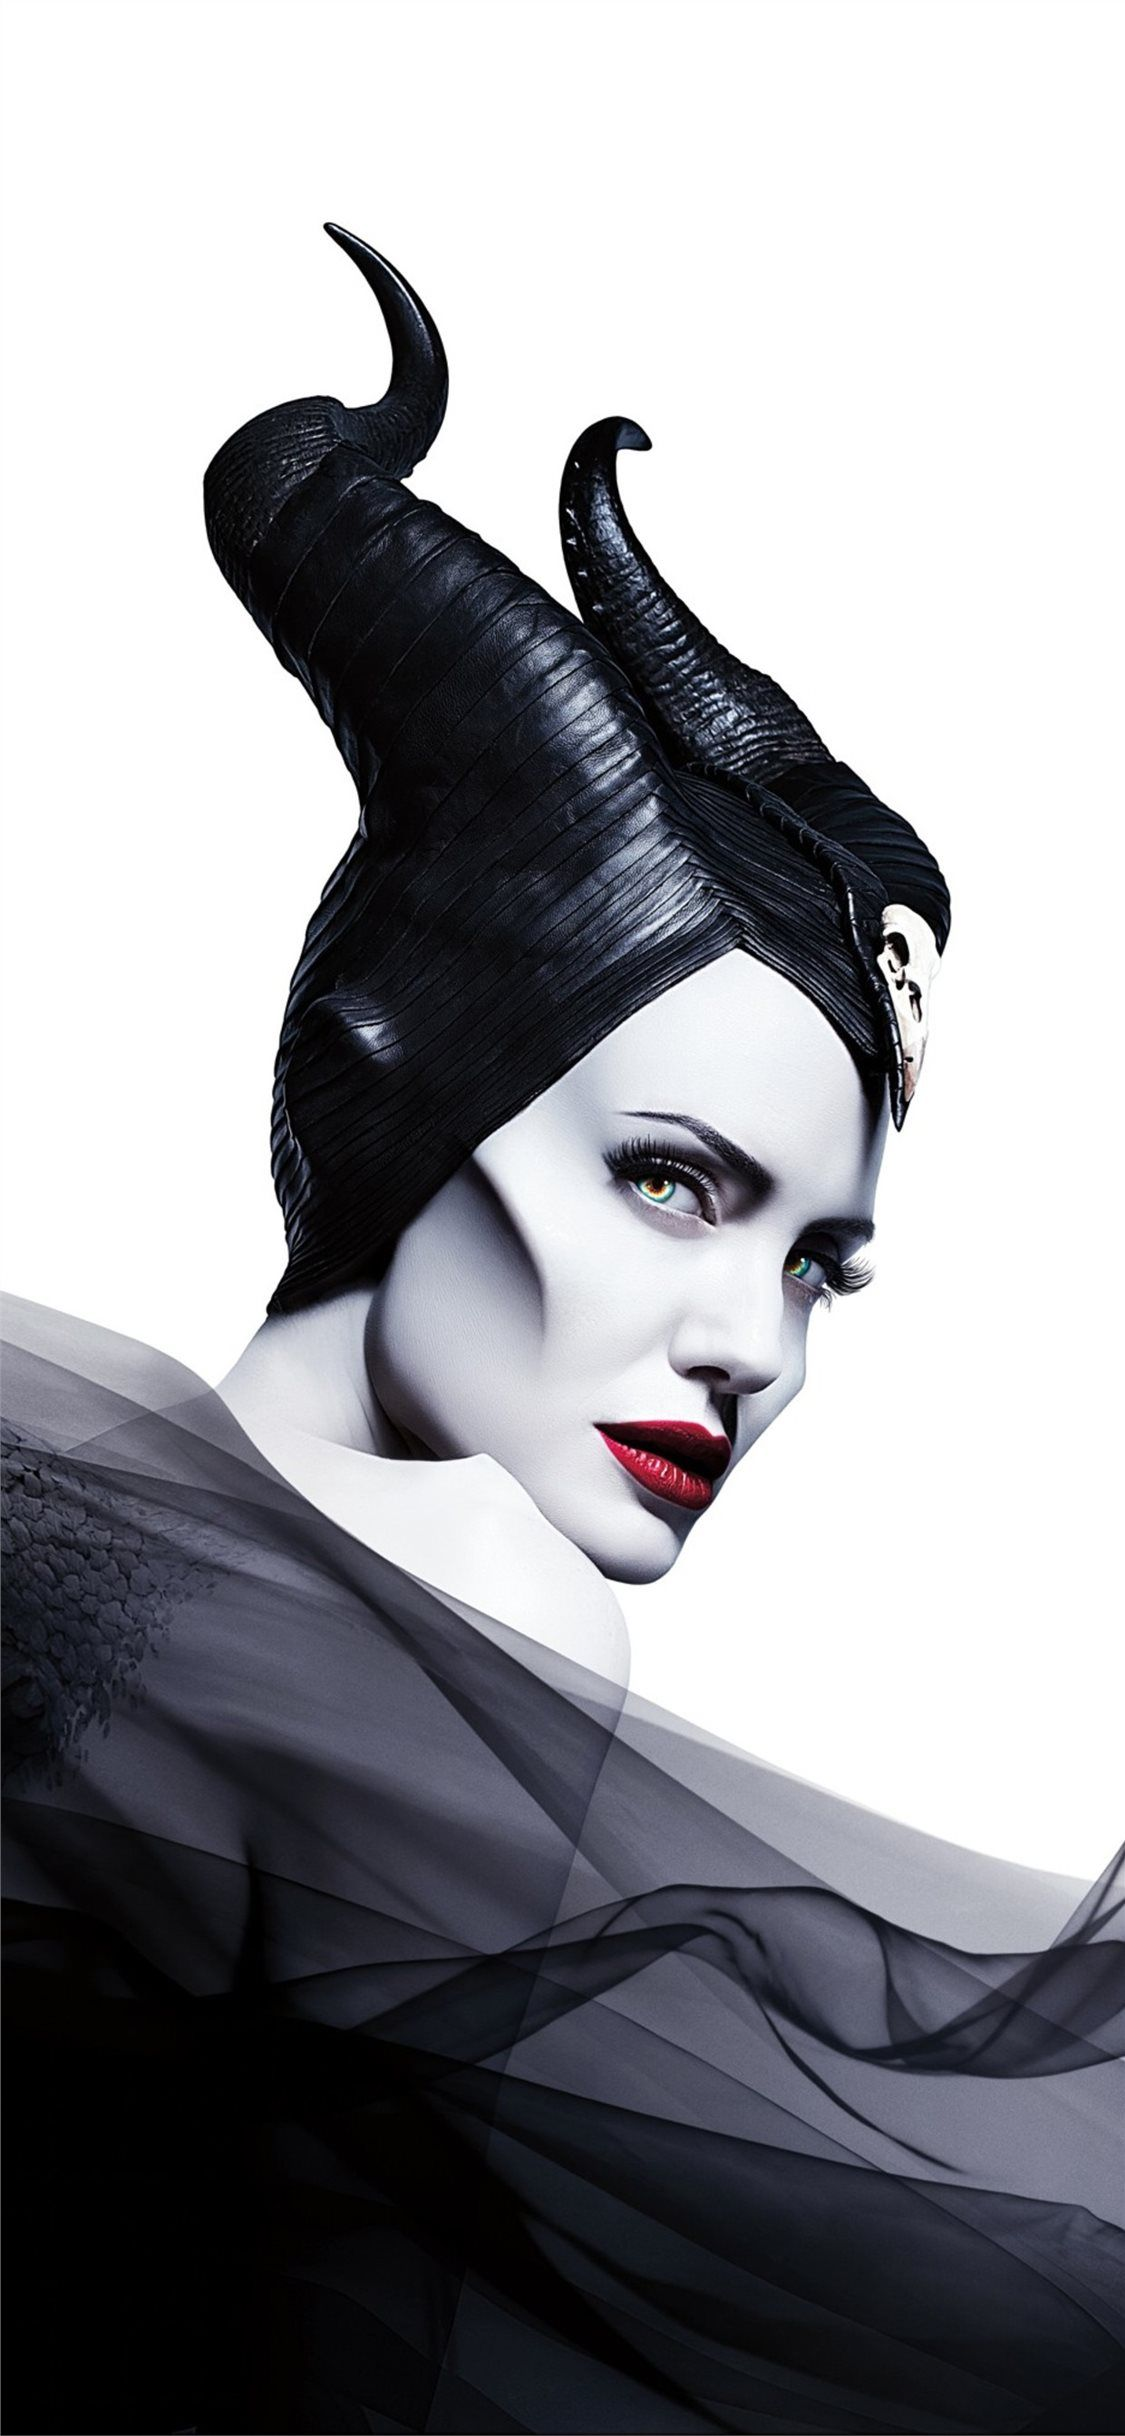 Angelina Jolie In Maleficent Mistress Of Evil 2019 4k Ultra Hd Mobile Wallpaper Maleficent Movie Maleficent Art Maleficent